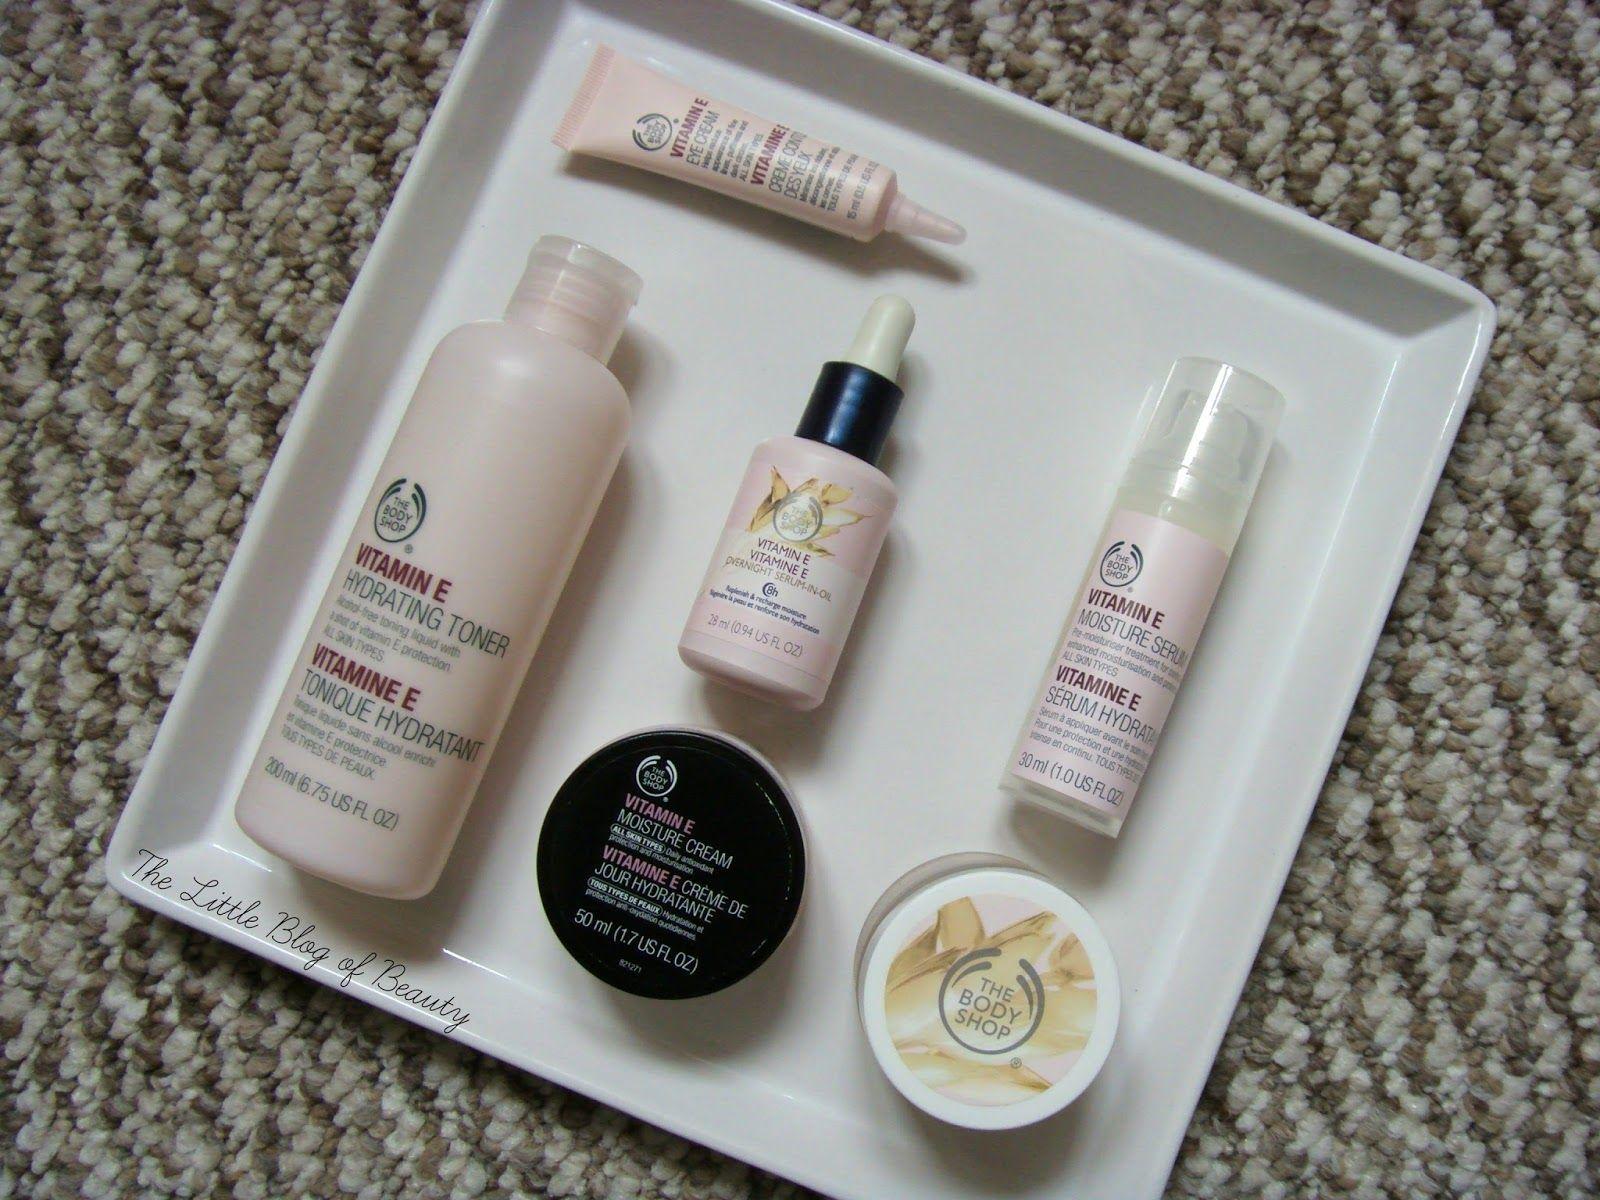 The Body Shop Vitamin E range